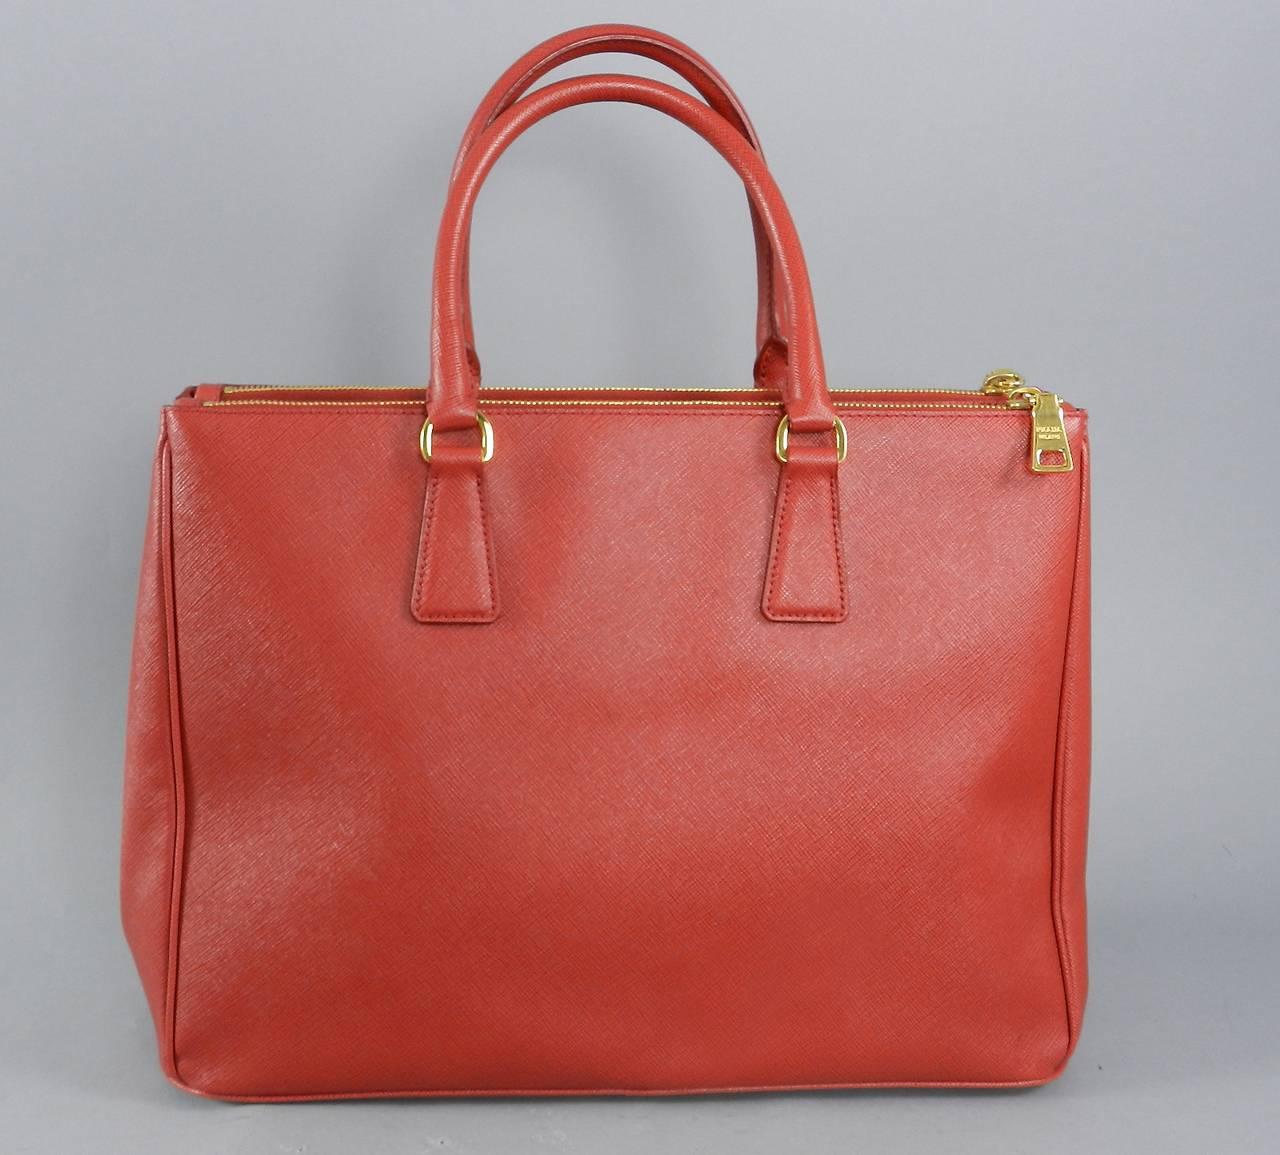 prada nylon messenger bags - Prada Red Saffiano Lux Double Zip Executive Tote at 1stdibs